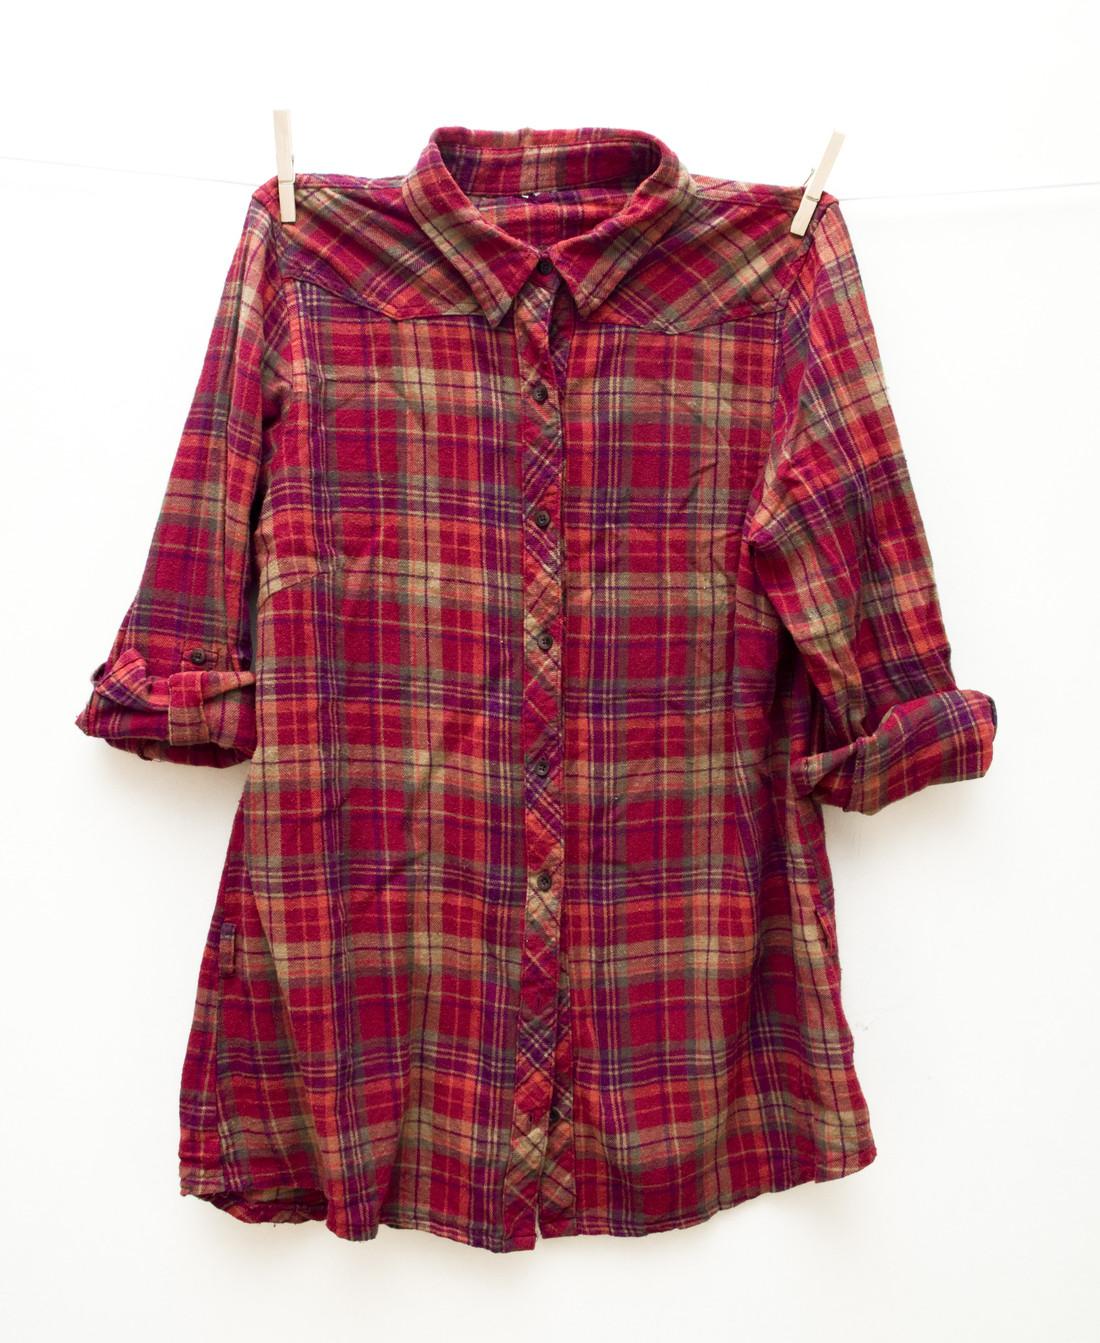 Red & purple shirt - Pop Sick Vintage